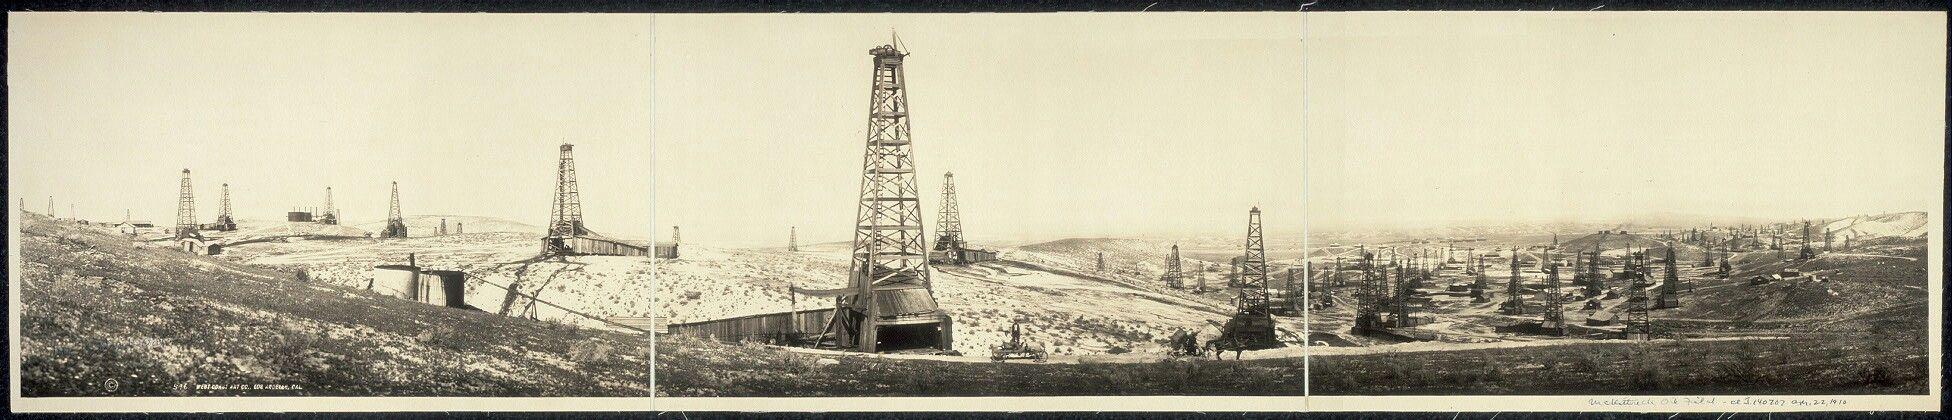 376 California Standard Oil Well 1, McKittrick Oil Field